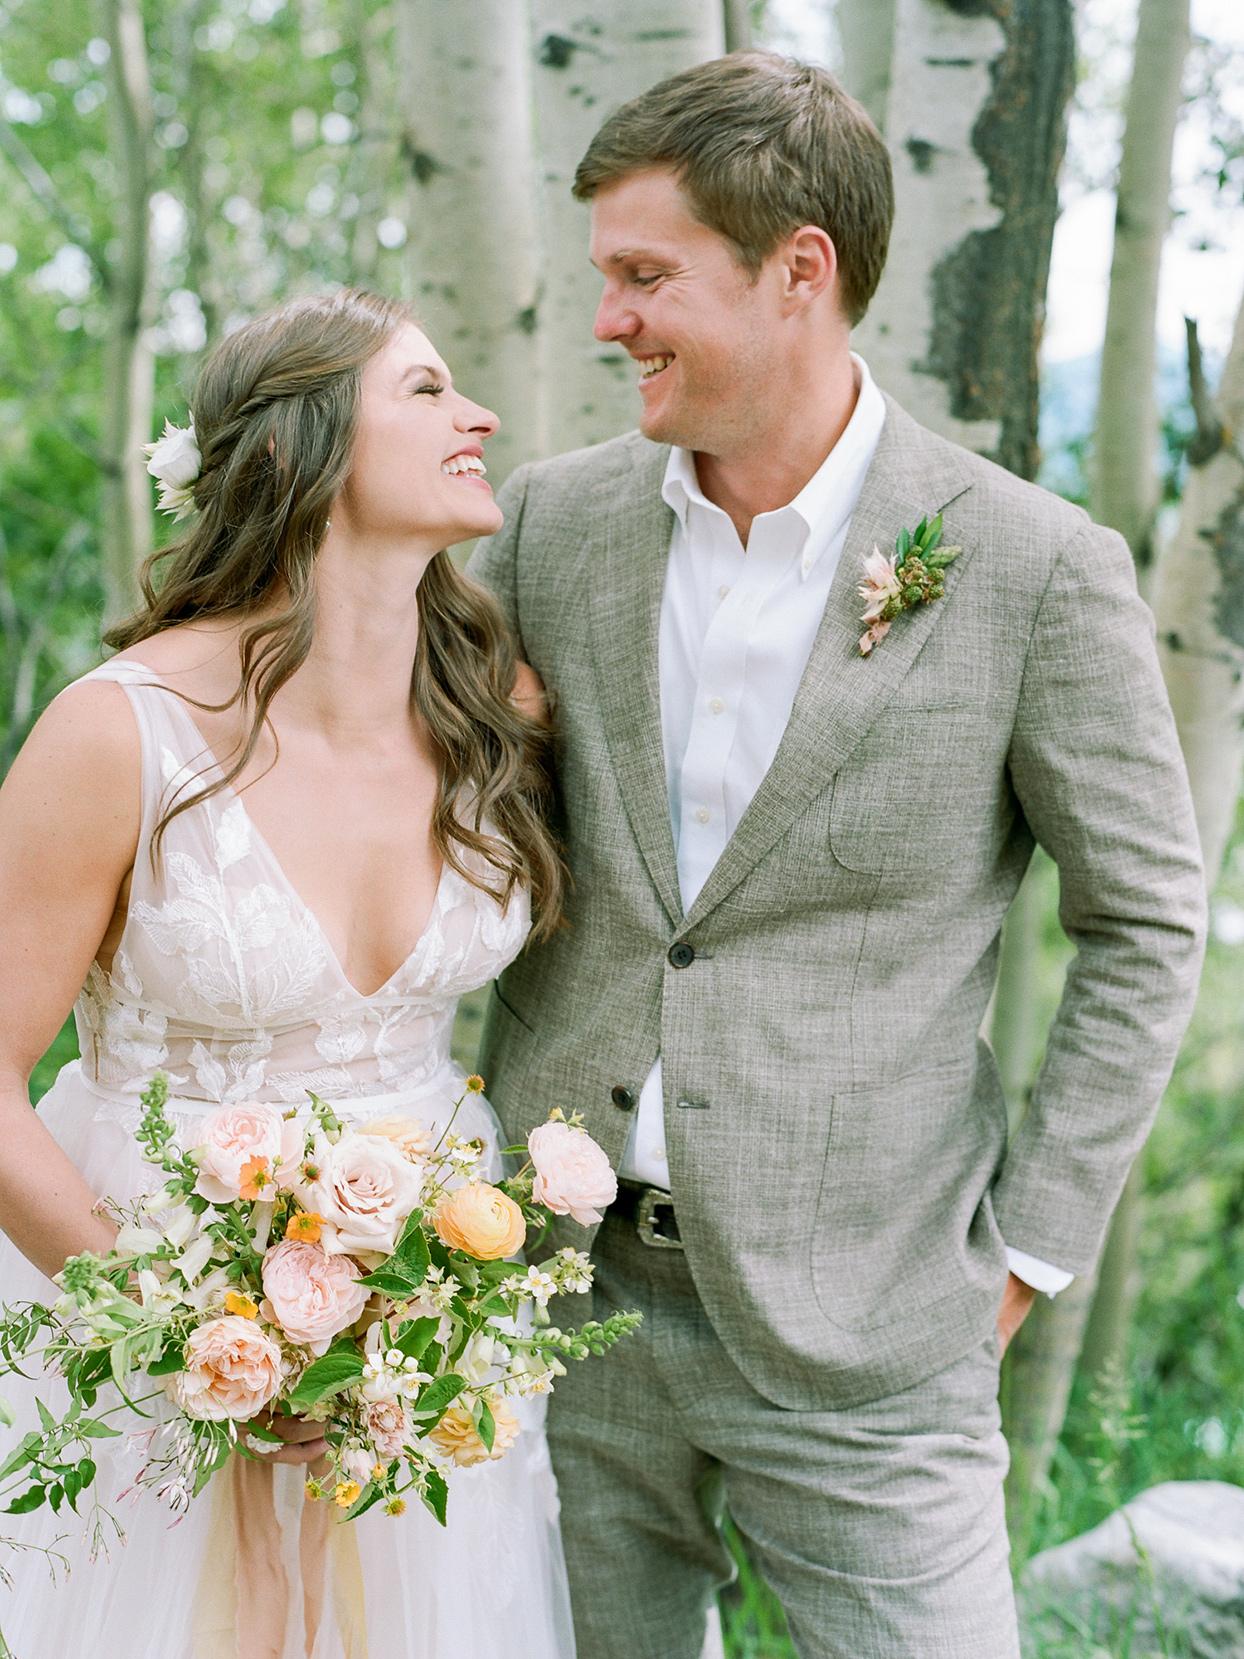 logan conor wedding couple smiling